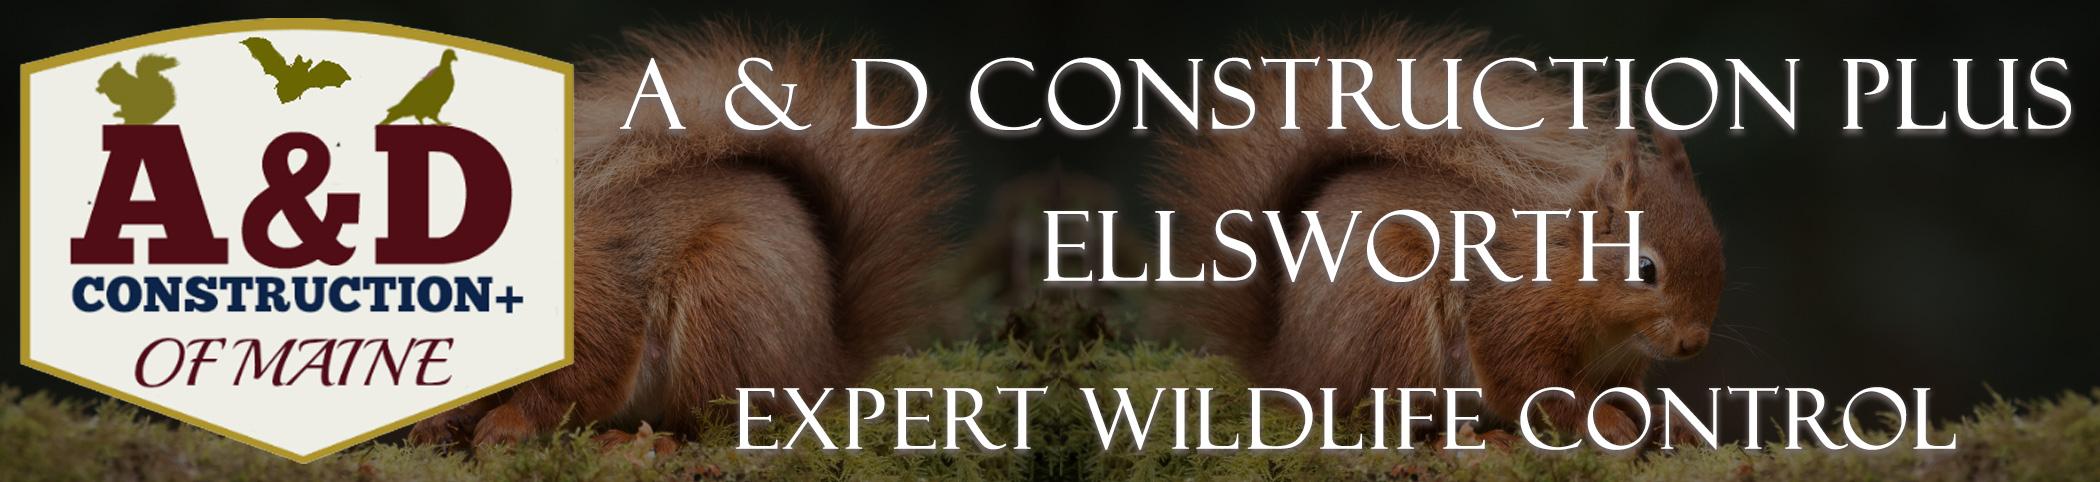 A and D Construction Plus Bat Removal Ellsworth Maine